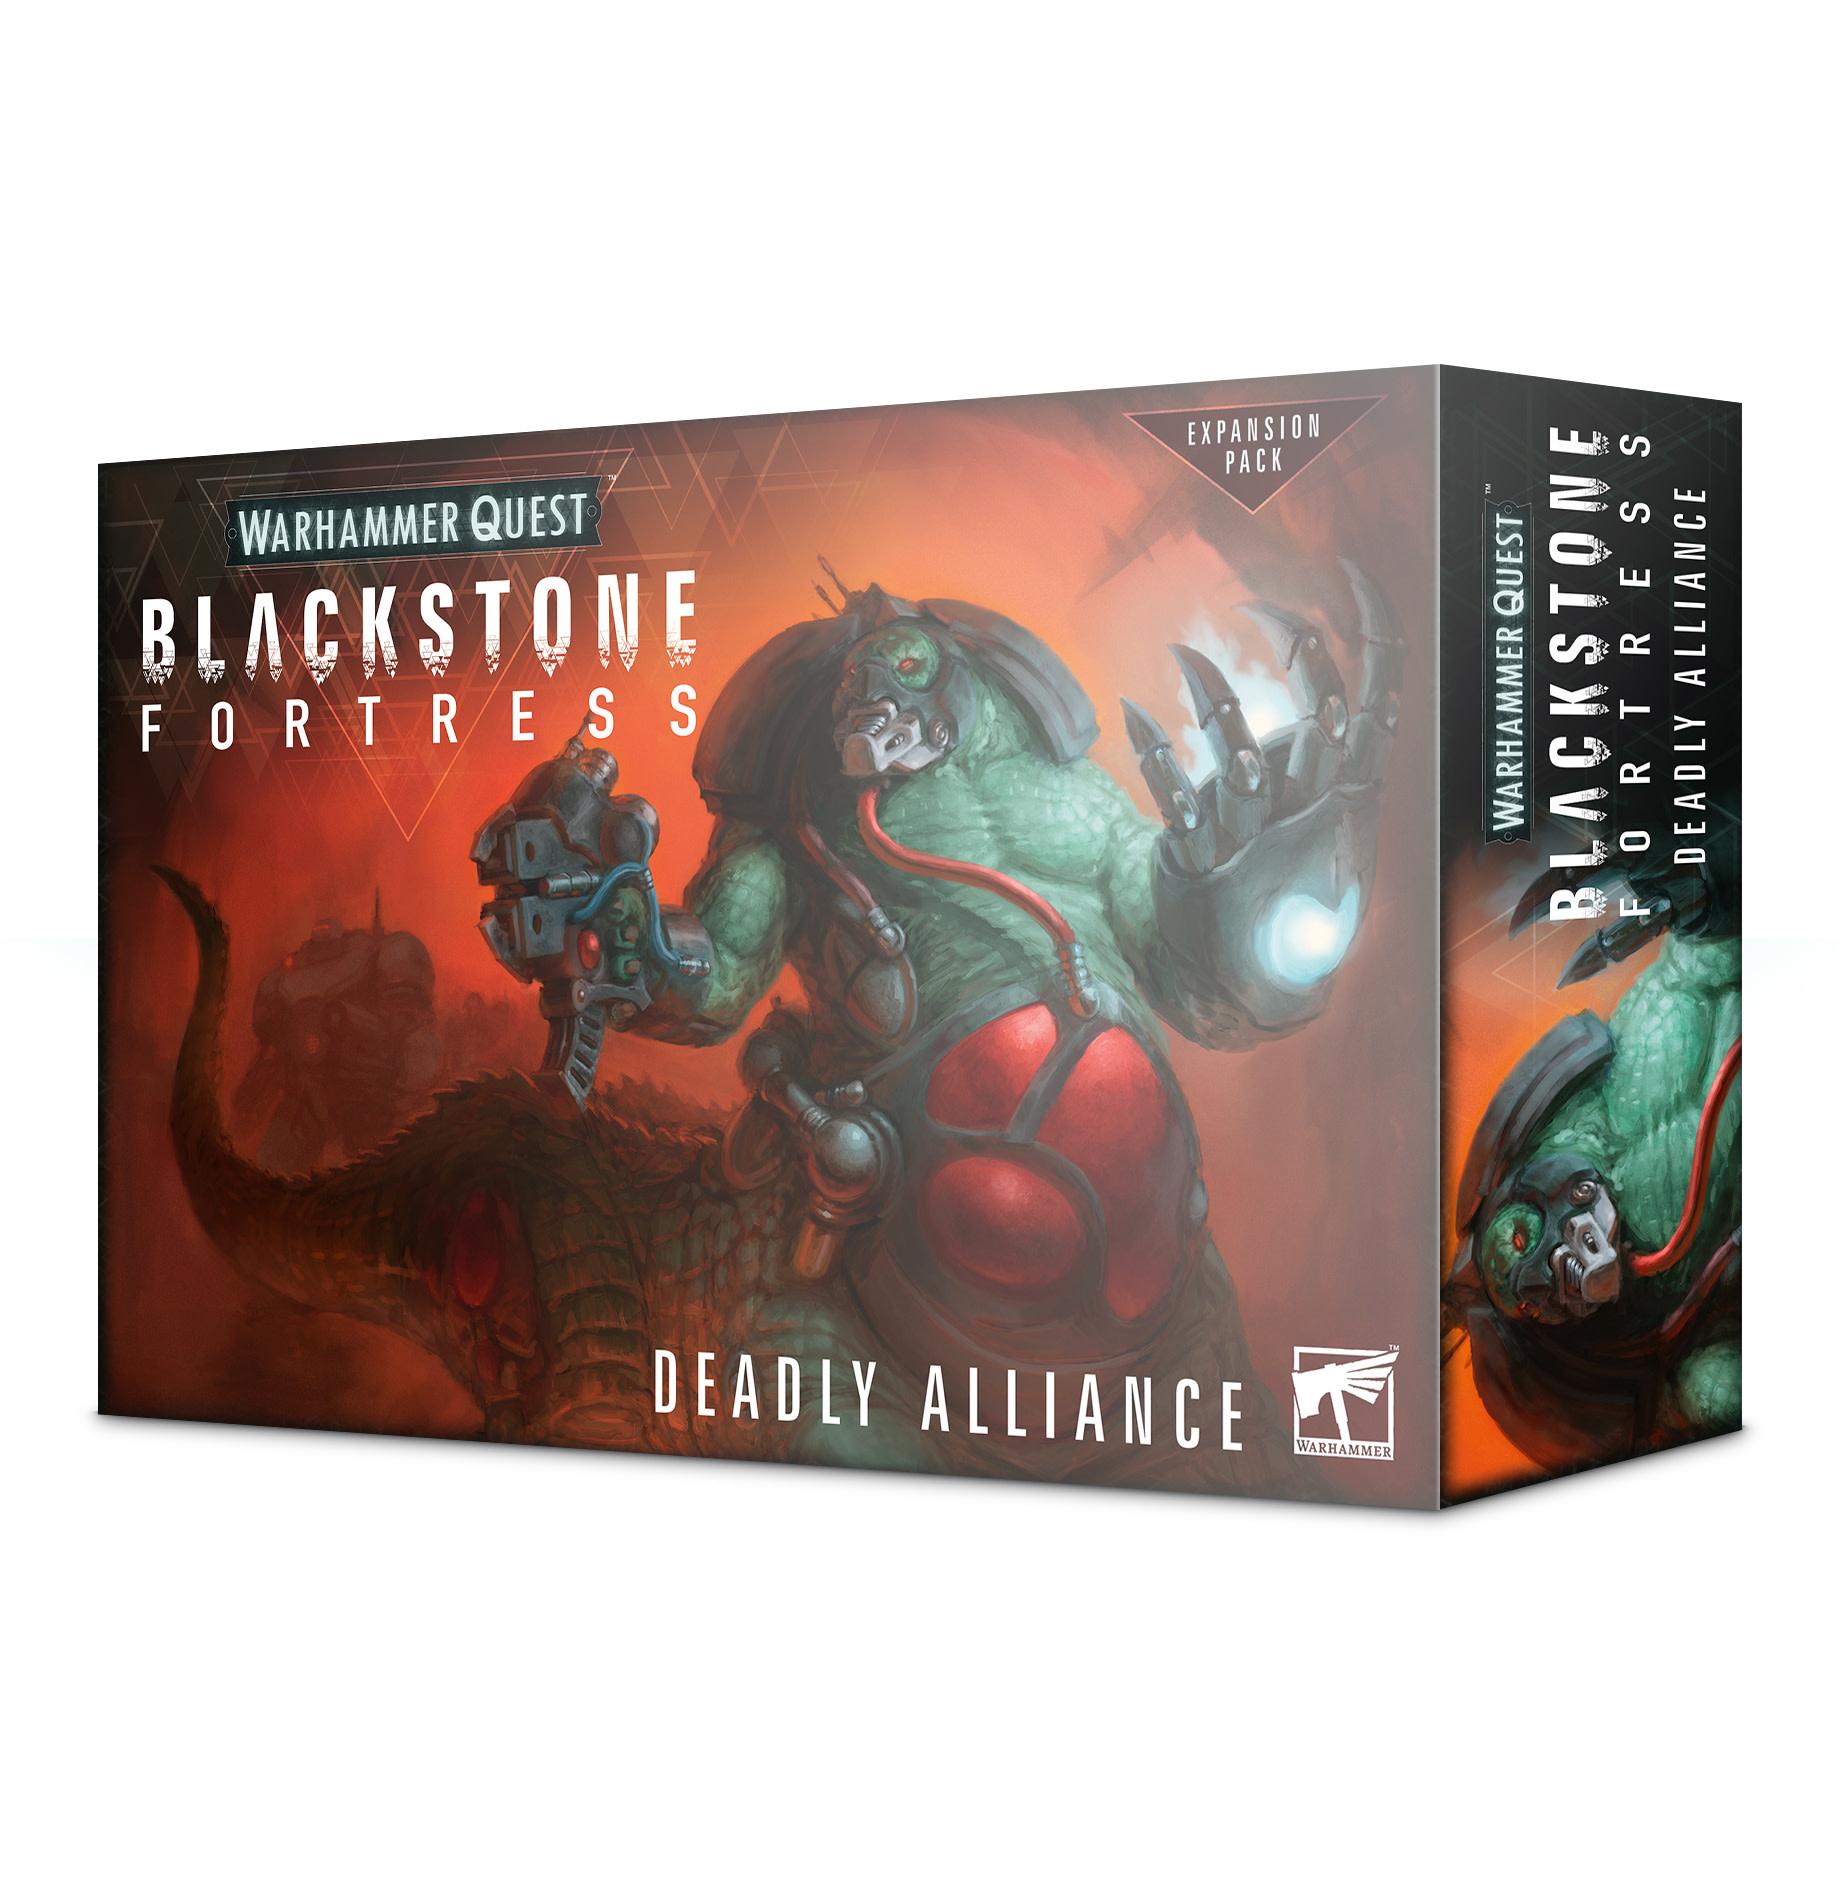 Blackstone Fortress: Deadly Alliance